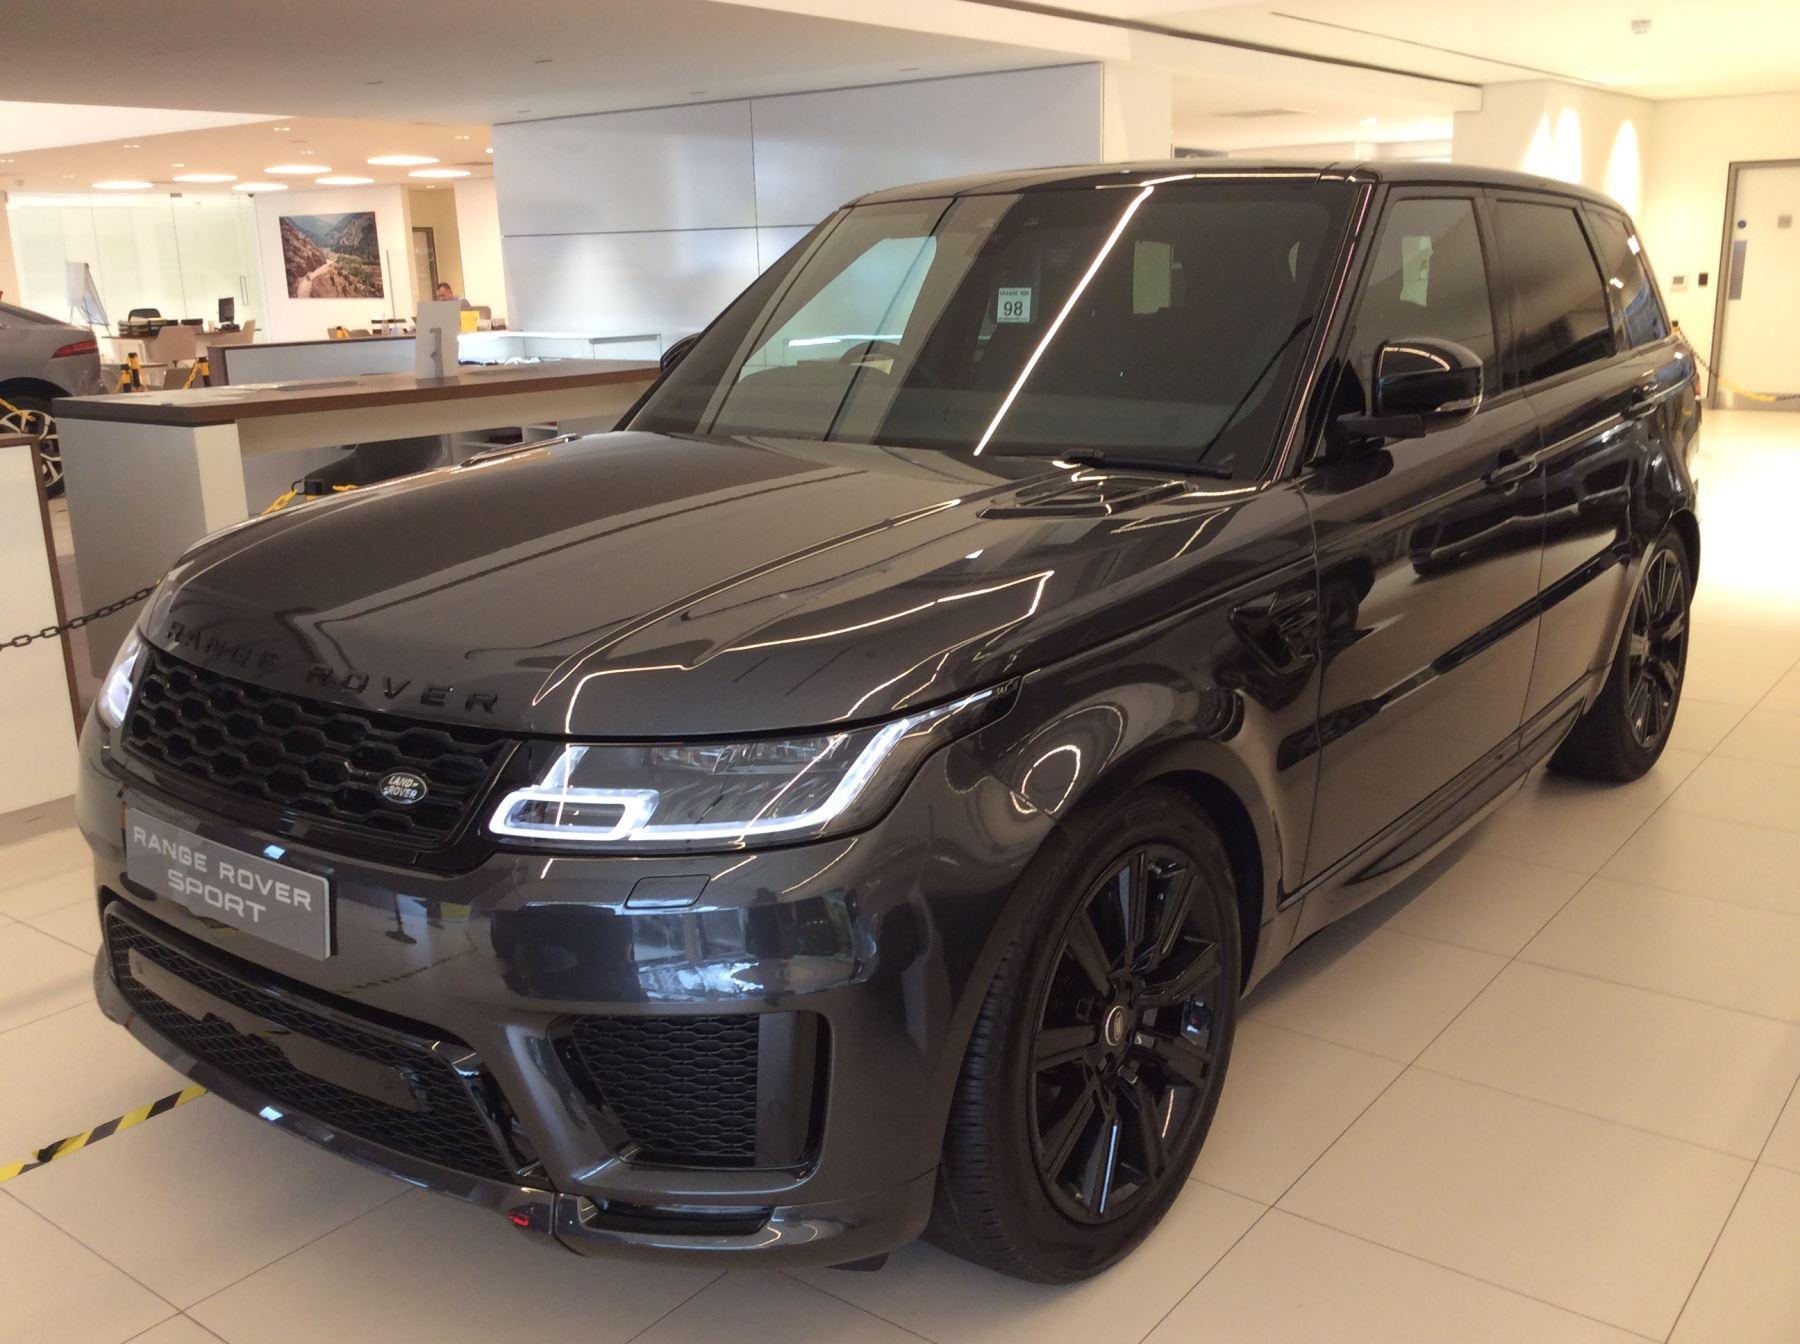 Land Rover Range Rover Sport 3.0 SDV6 (306) HSE Dynamic (7 seat) Diesel Automatic 5 door Estate